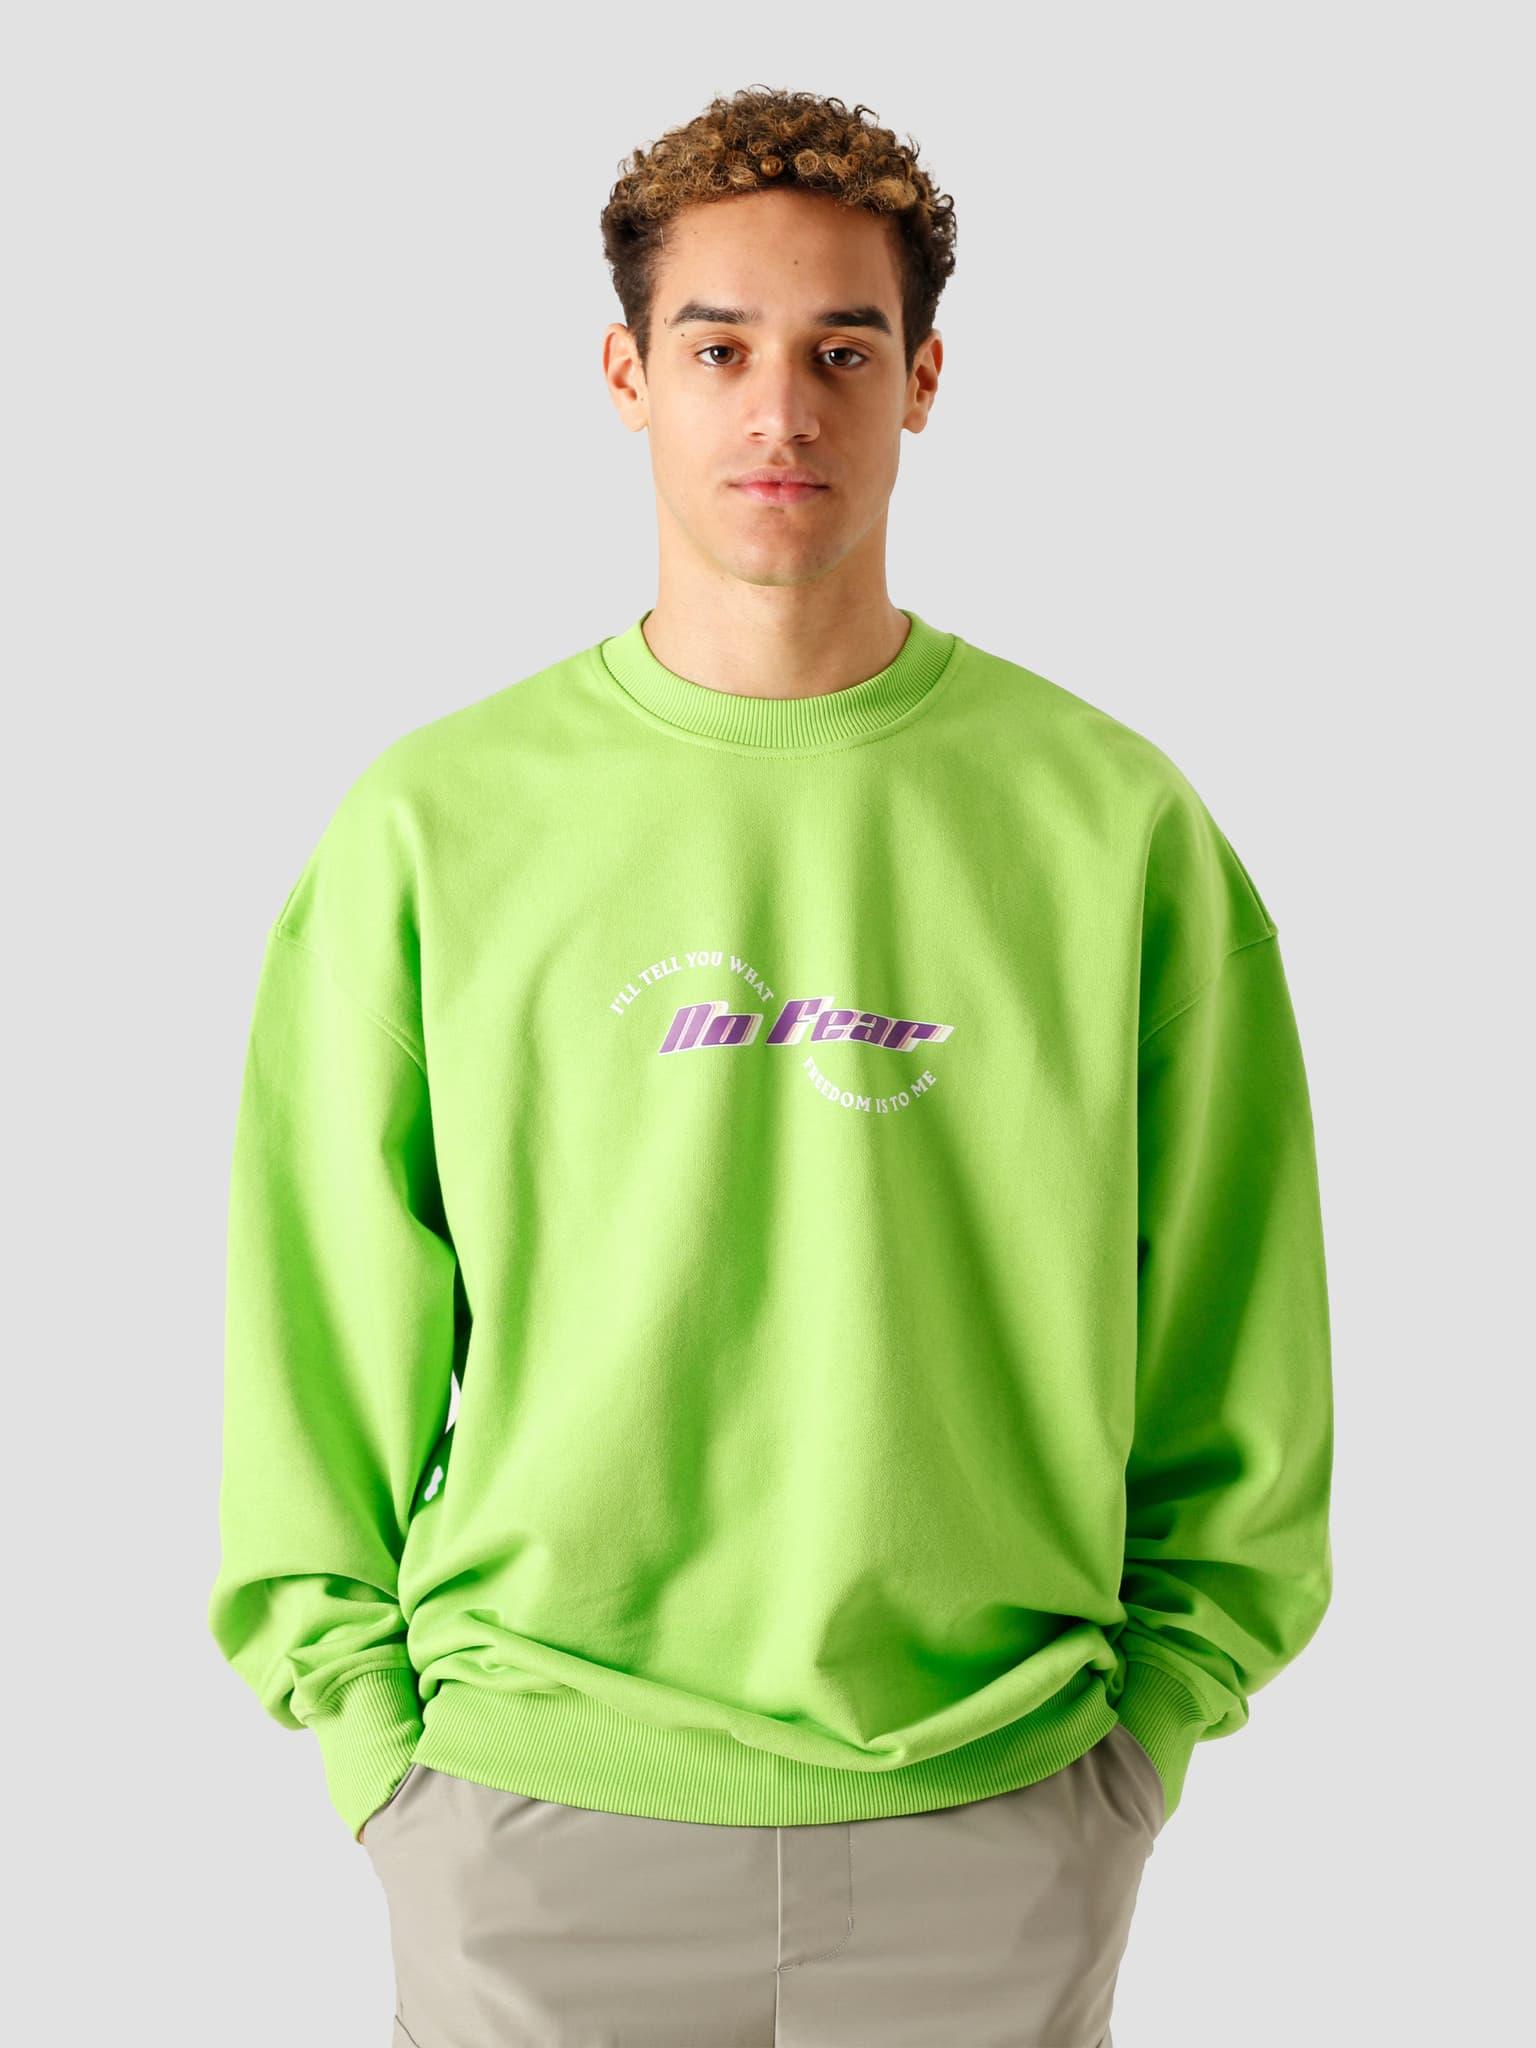 Kerjas Oversized T-Shirt Jasmine Green 2111145